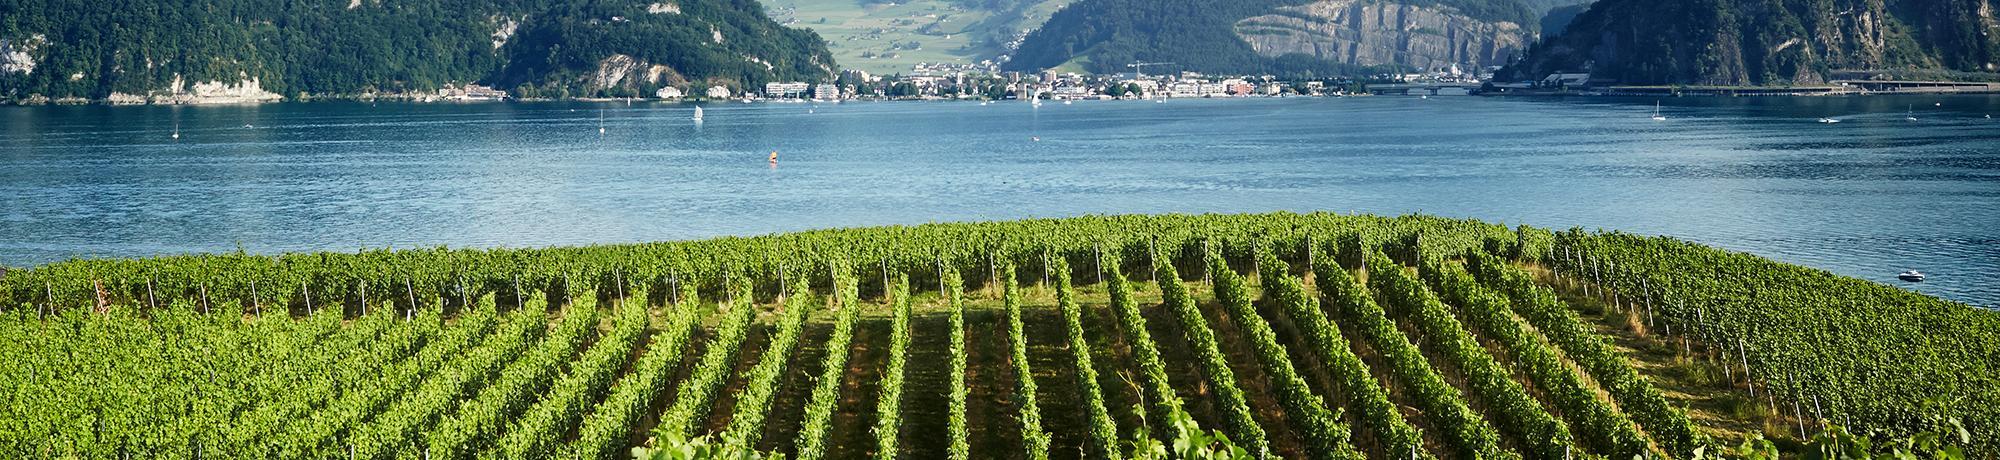 Landschaft Reben am See